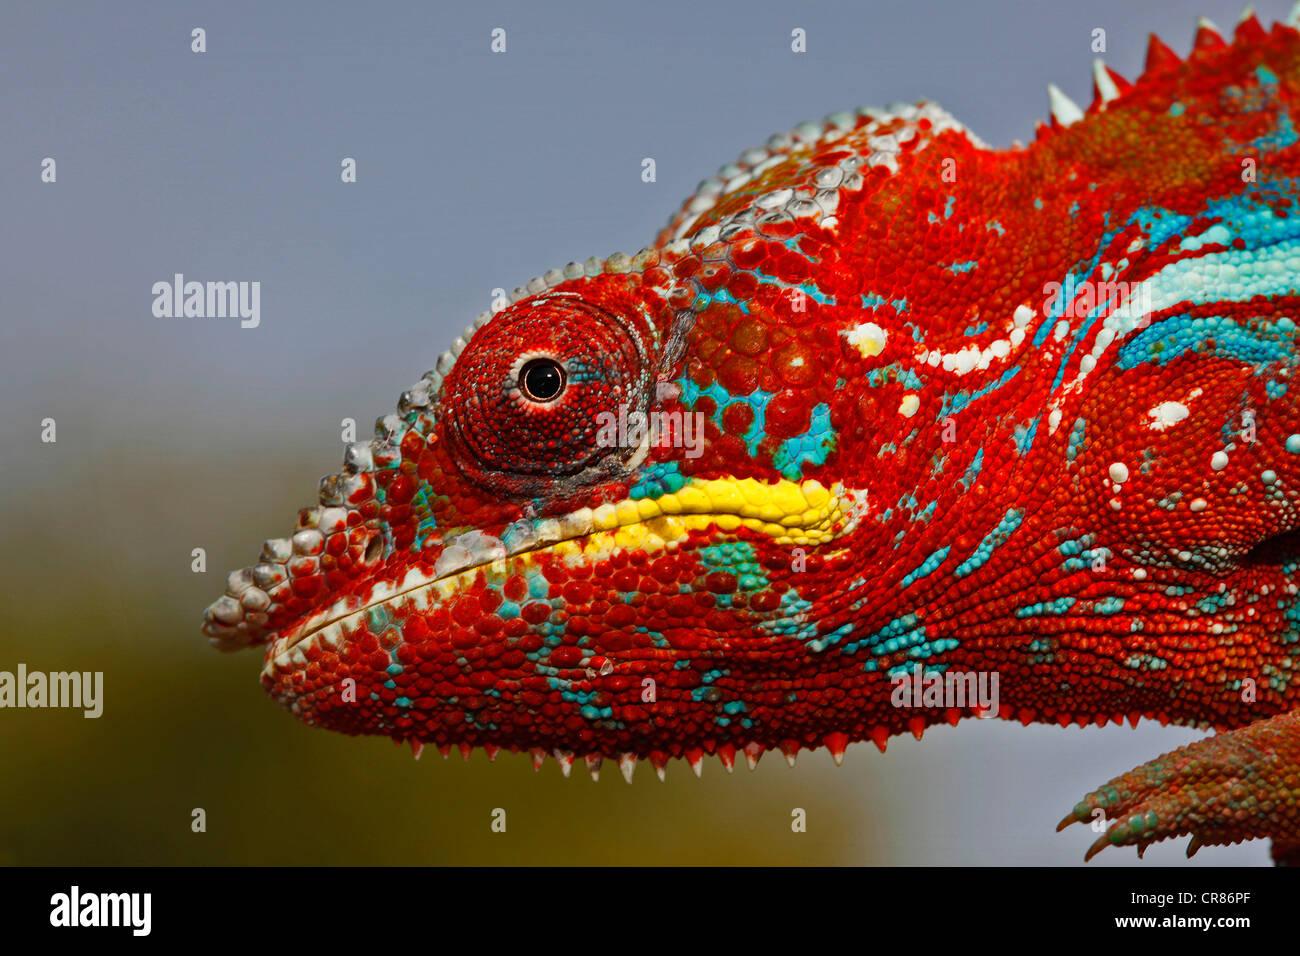 Pantherchamäleon (Furcifer Pardalis), Ambilobe-Ambilorama Farbabweichungen, Porträt, Madagaskar, Afrika, Stockbild